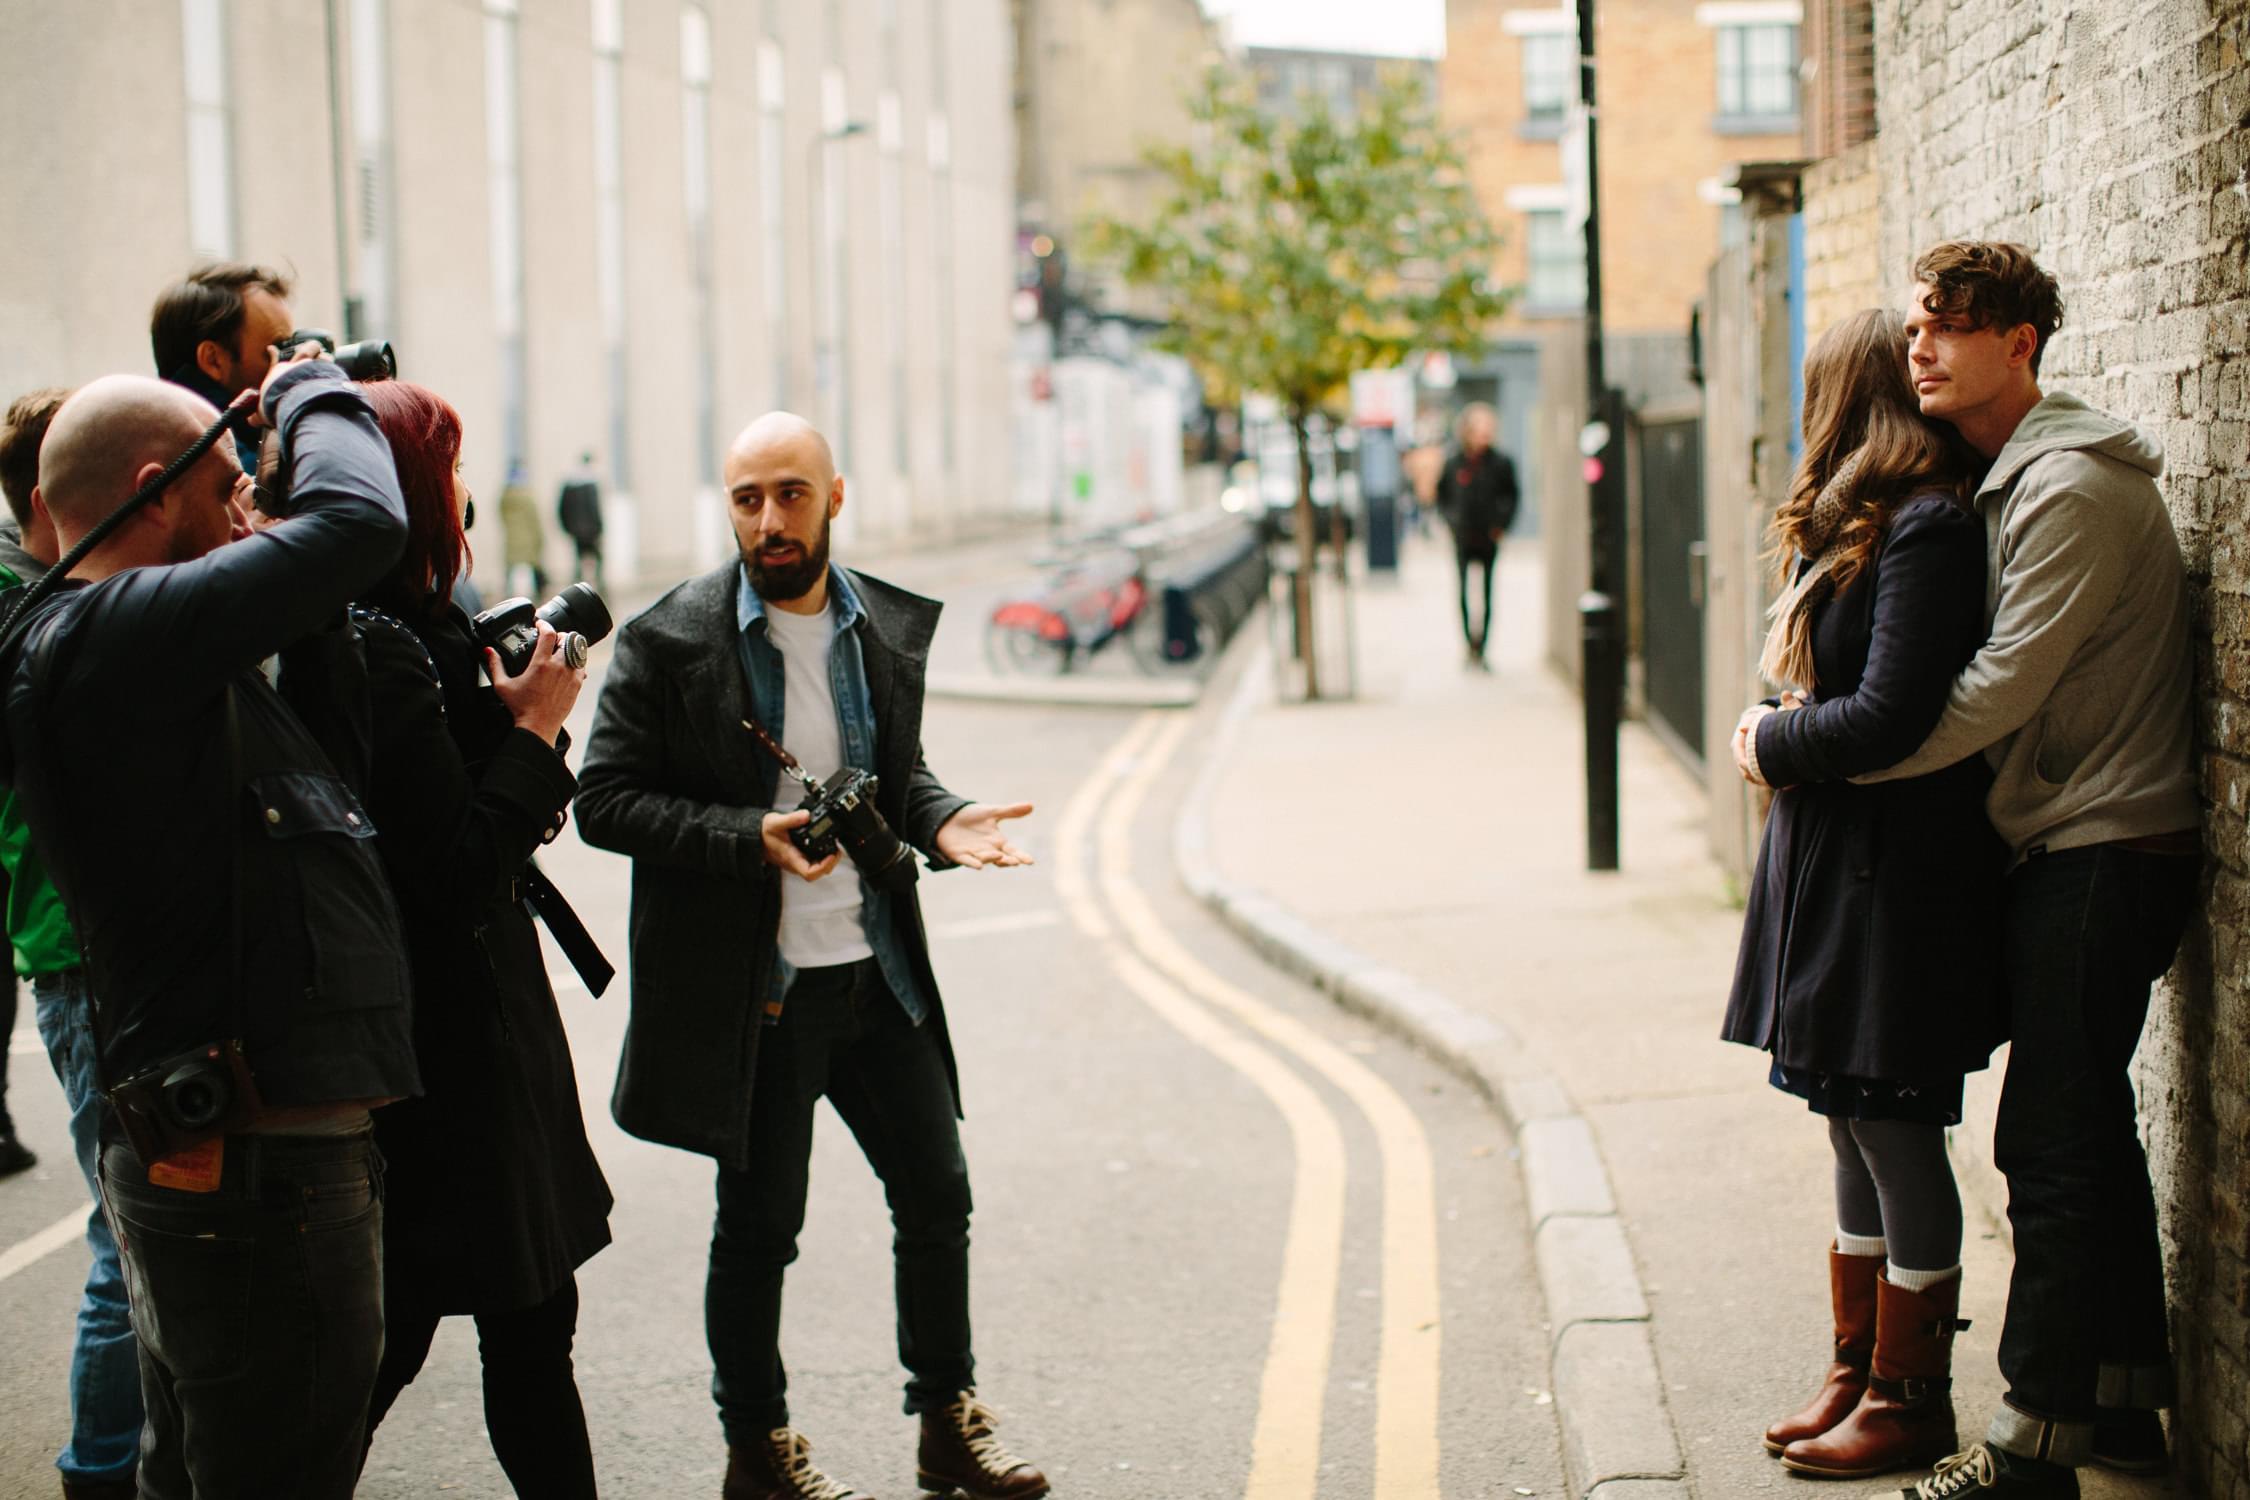 share-the-journey-london-wedding-photography-workshop-20